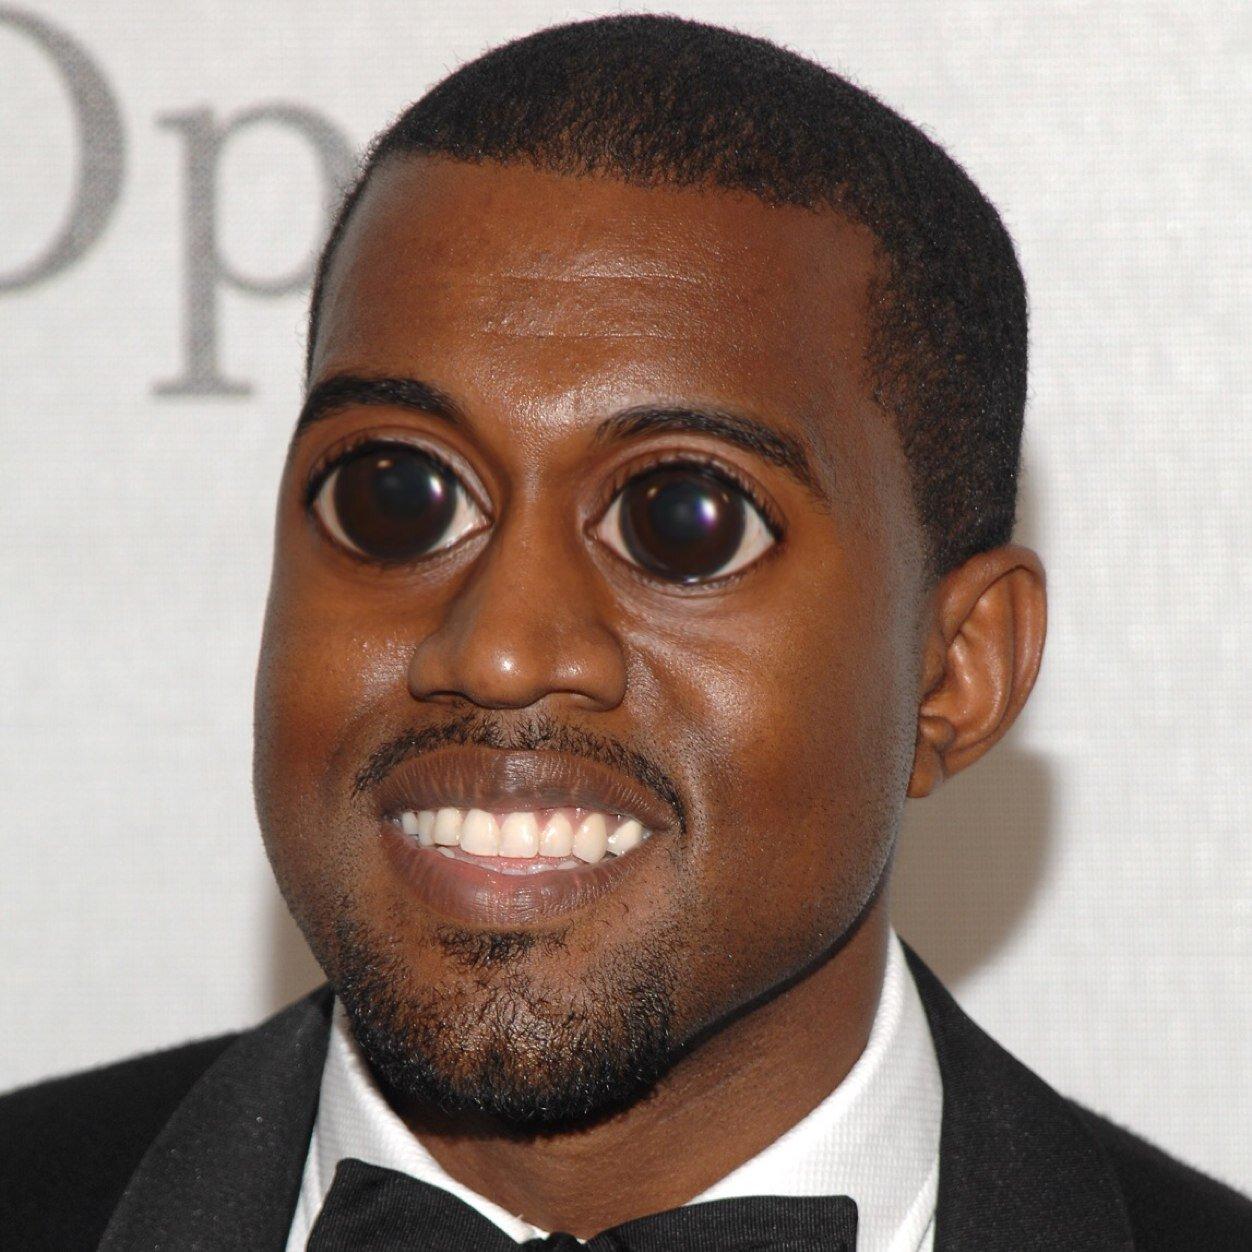 celebs with big eyes celebswbigeyes twitter